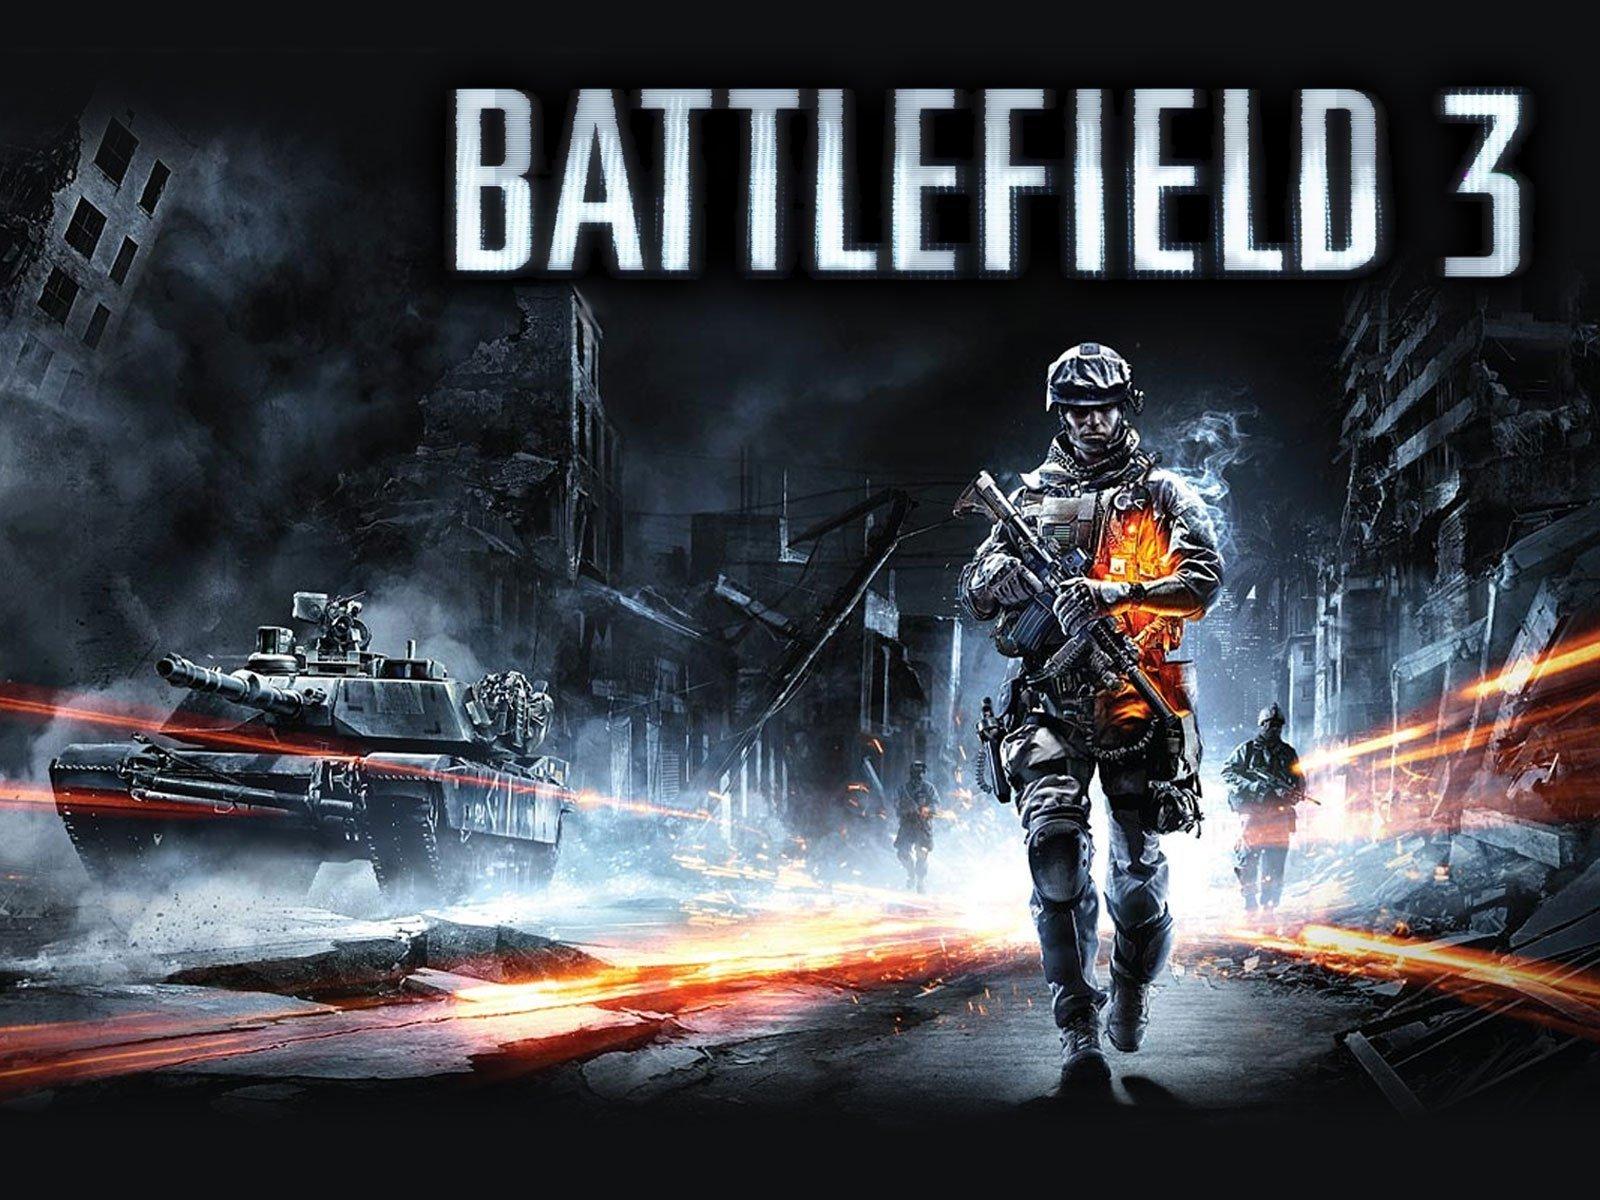 Battlefield 3   battlefield bad company Wallpaper 19148116 1600x1200